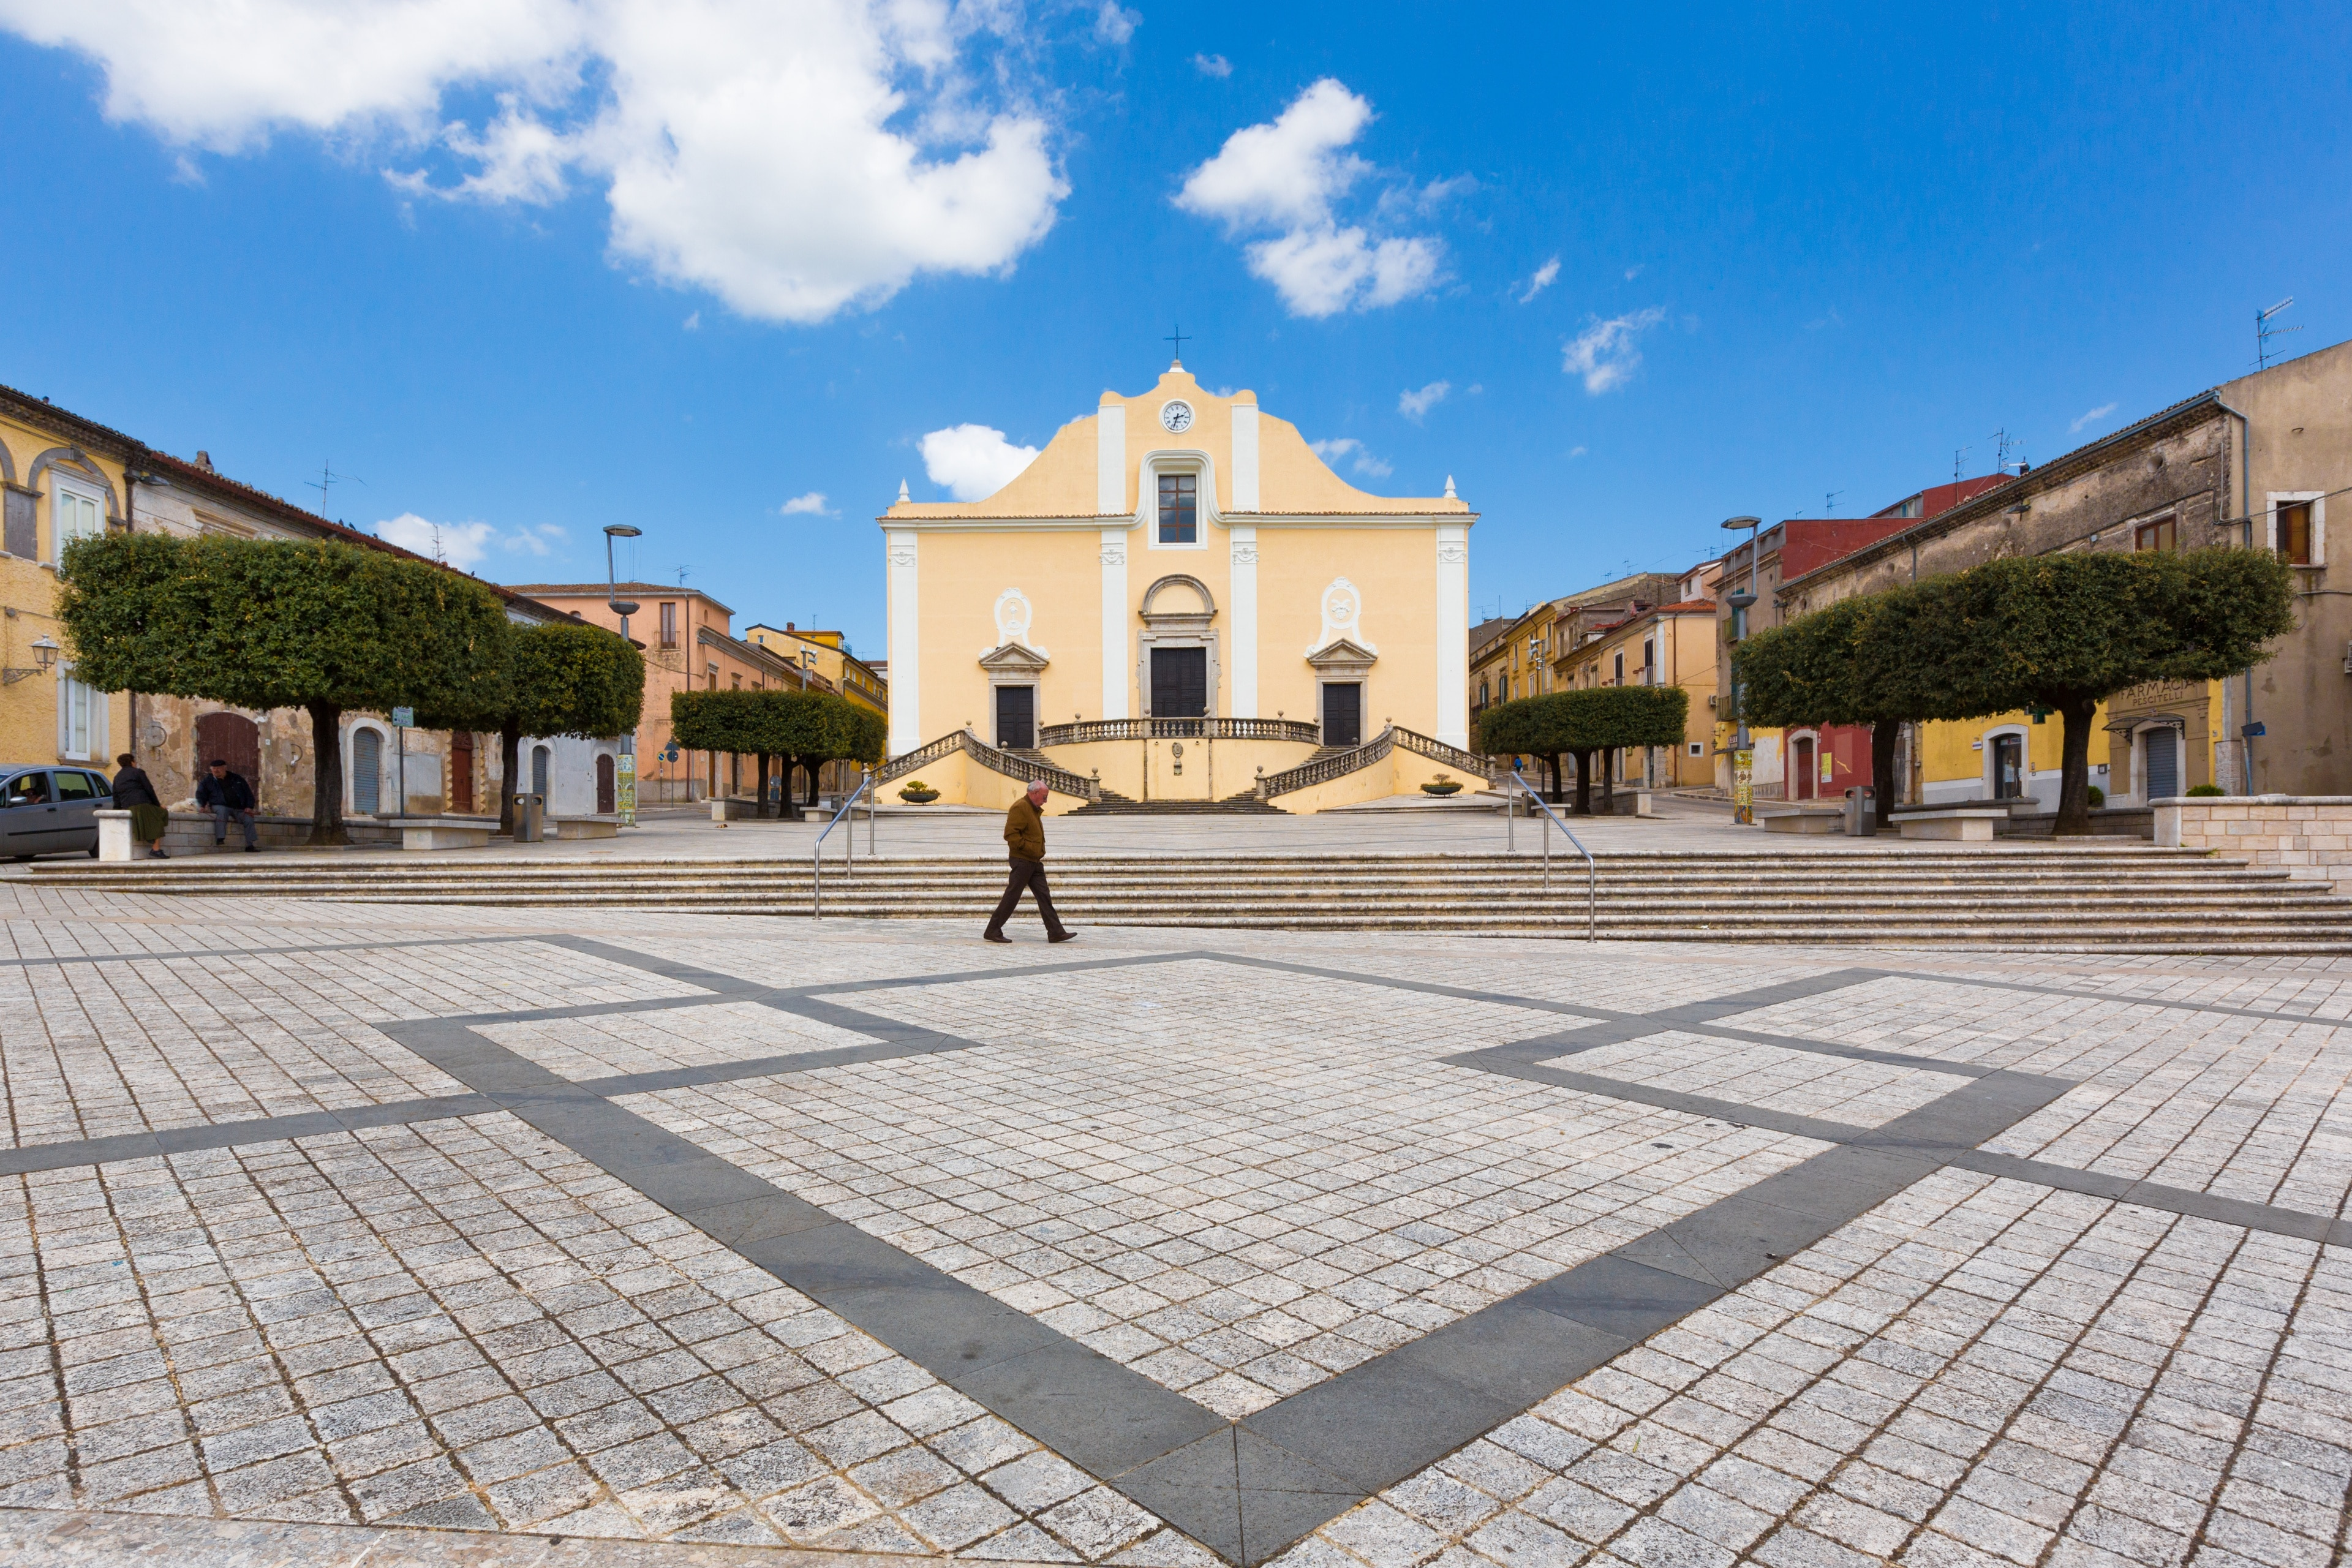 Benevento, Campania, Italy